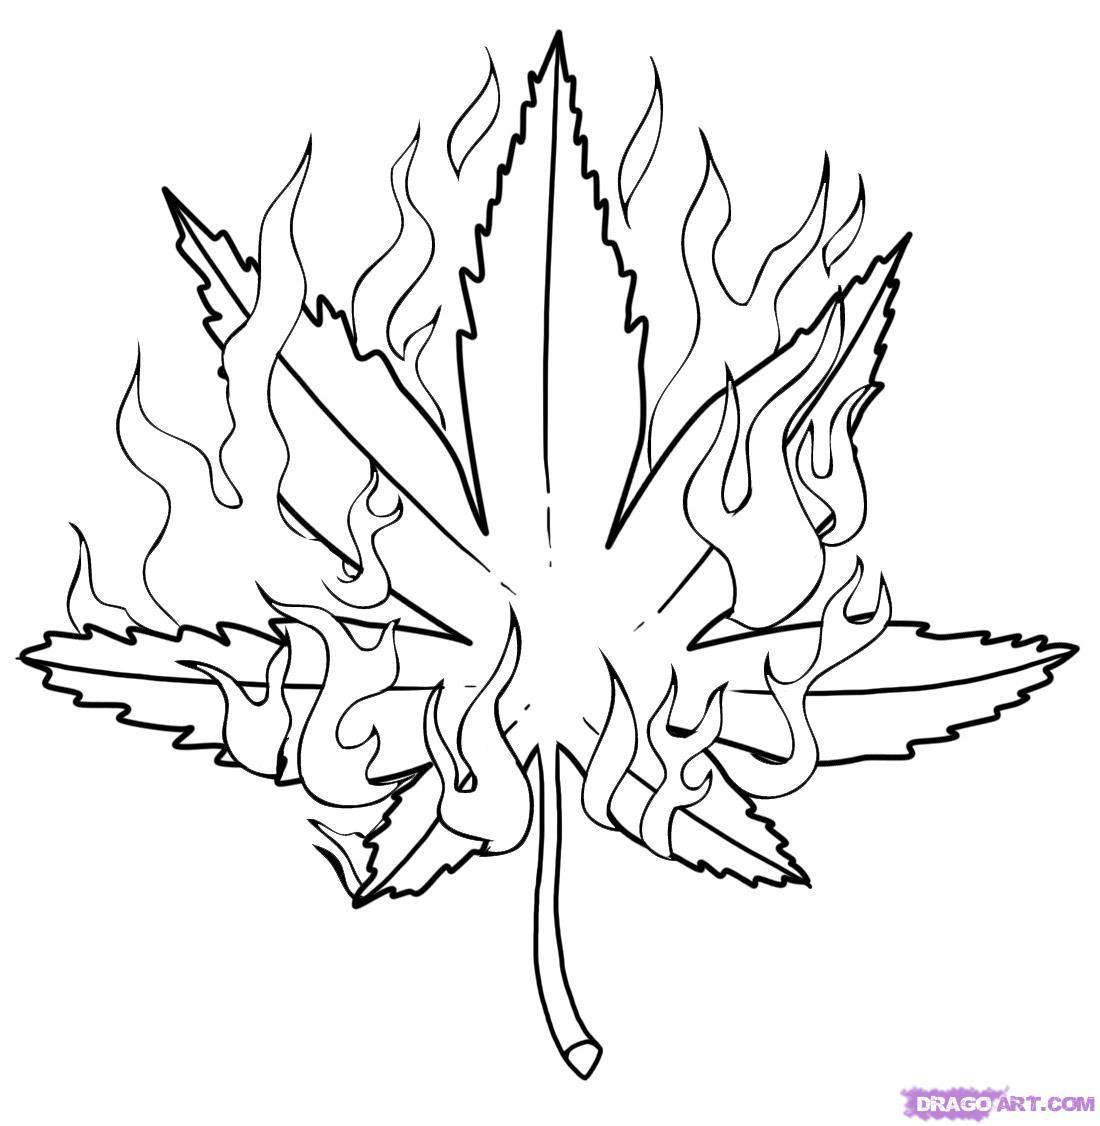 Weeds coloring #18, Download drawings